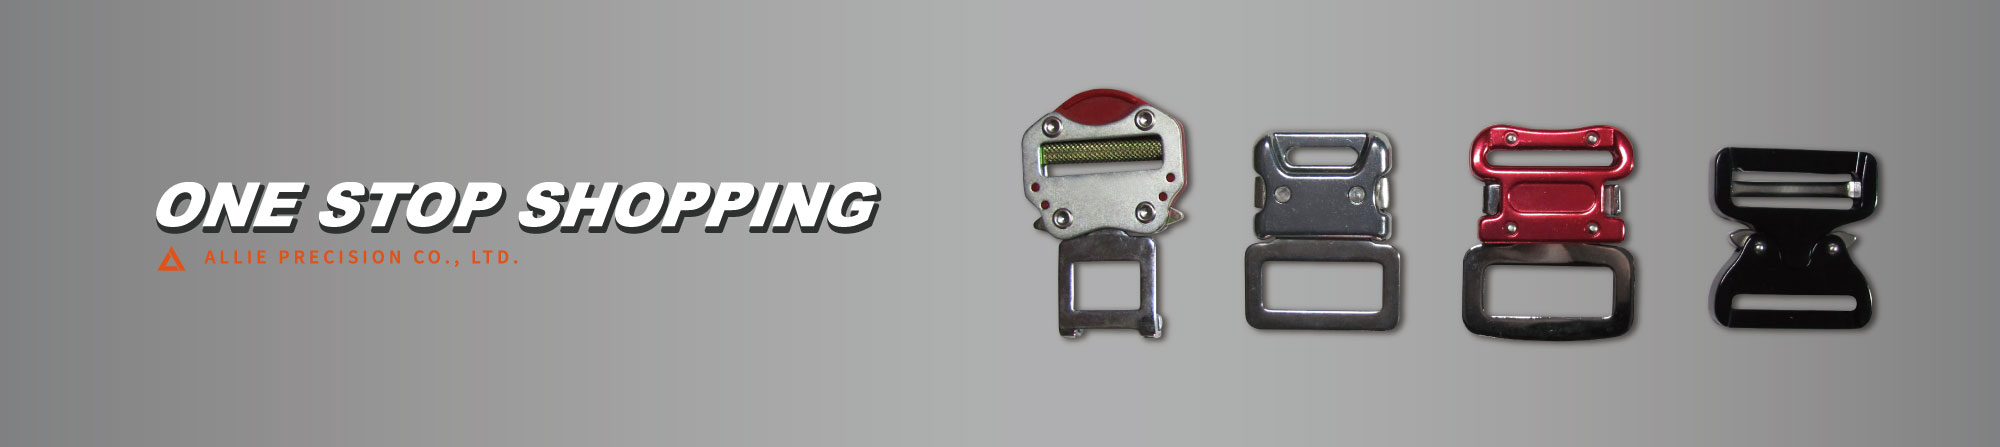 sternal D-ring manufacturer,sternal D-ring supplier,shoulder D-ring OEM,shoulder D-ring ODM,shoulder D-ring manufacturer,shoulder D-ring supplier,dorsal r-ring OEM,dorsal r-ring ODM,dorsal r-ring manufacturer,dorsal r-ring supplier